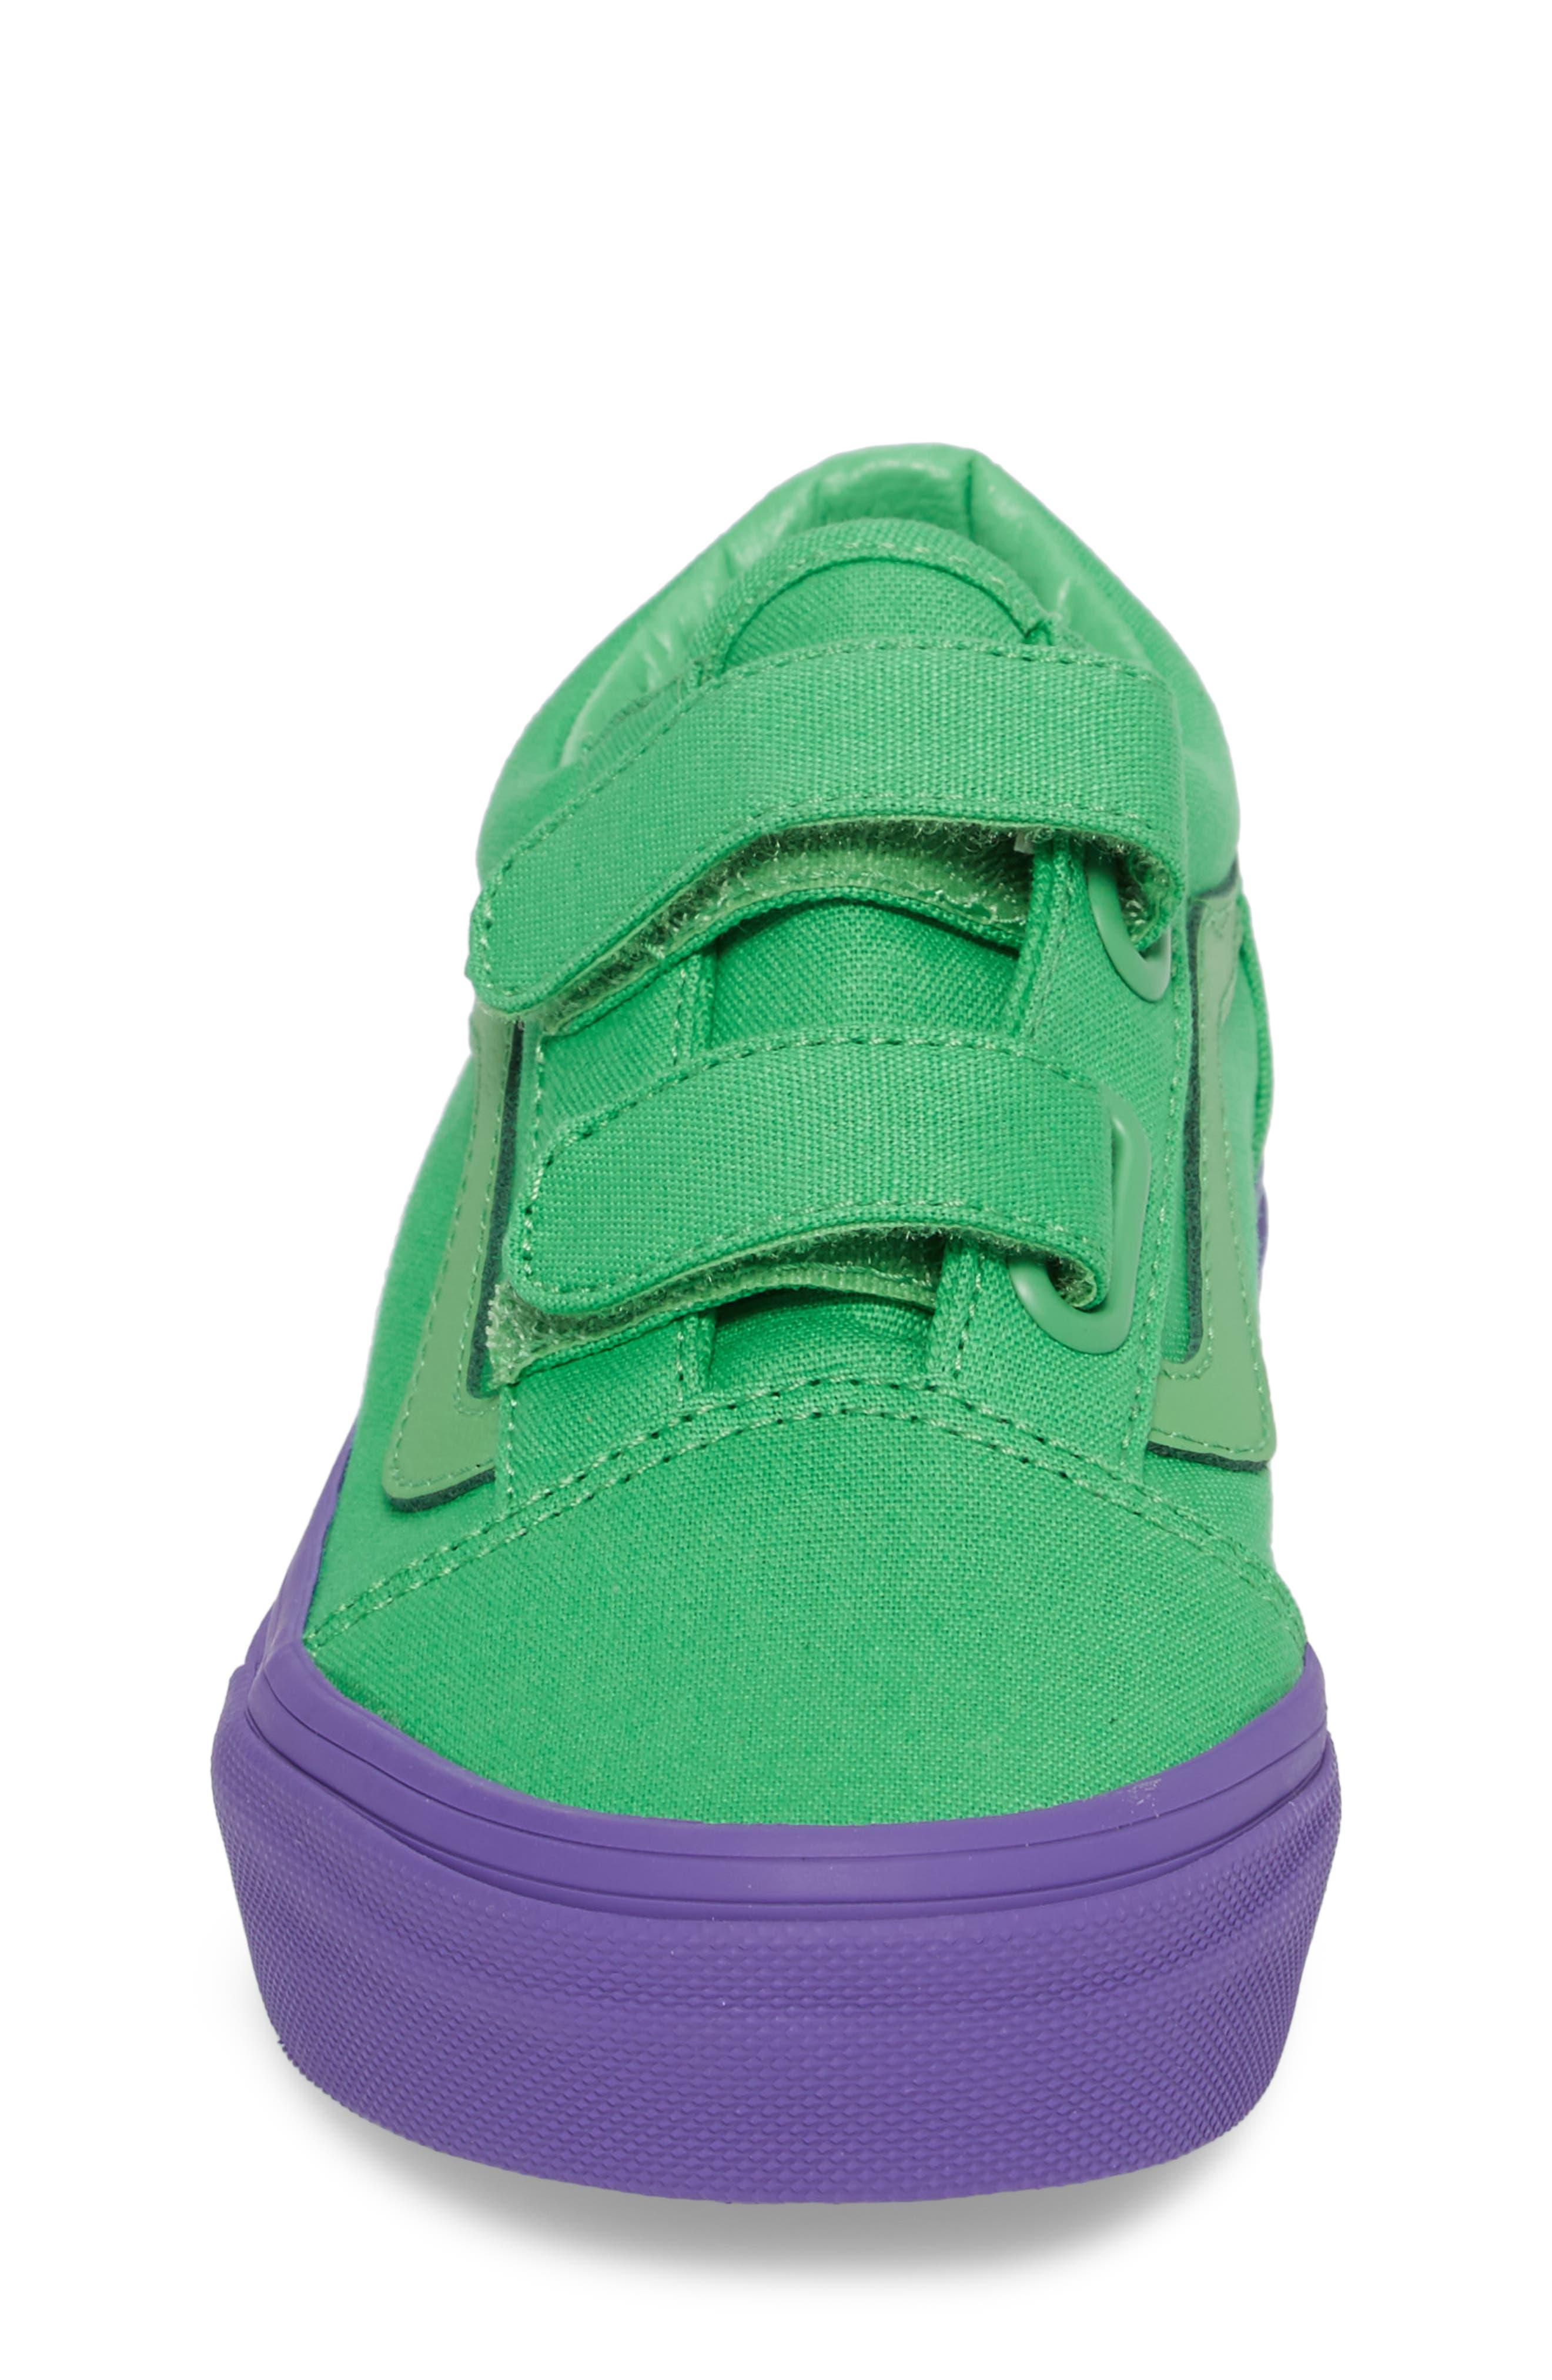 Old Skool V Sneaker,                             Alternate thumbnail 4, color,                             Green/ Purple Cosplay